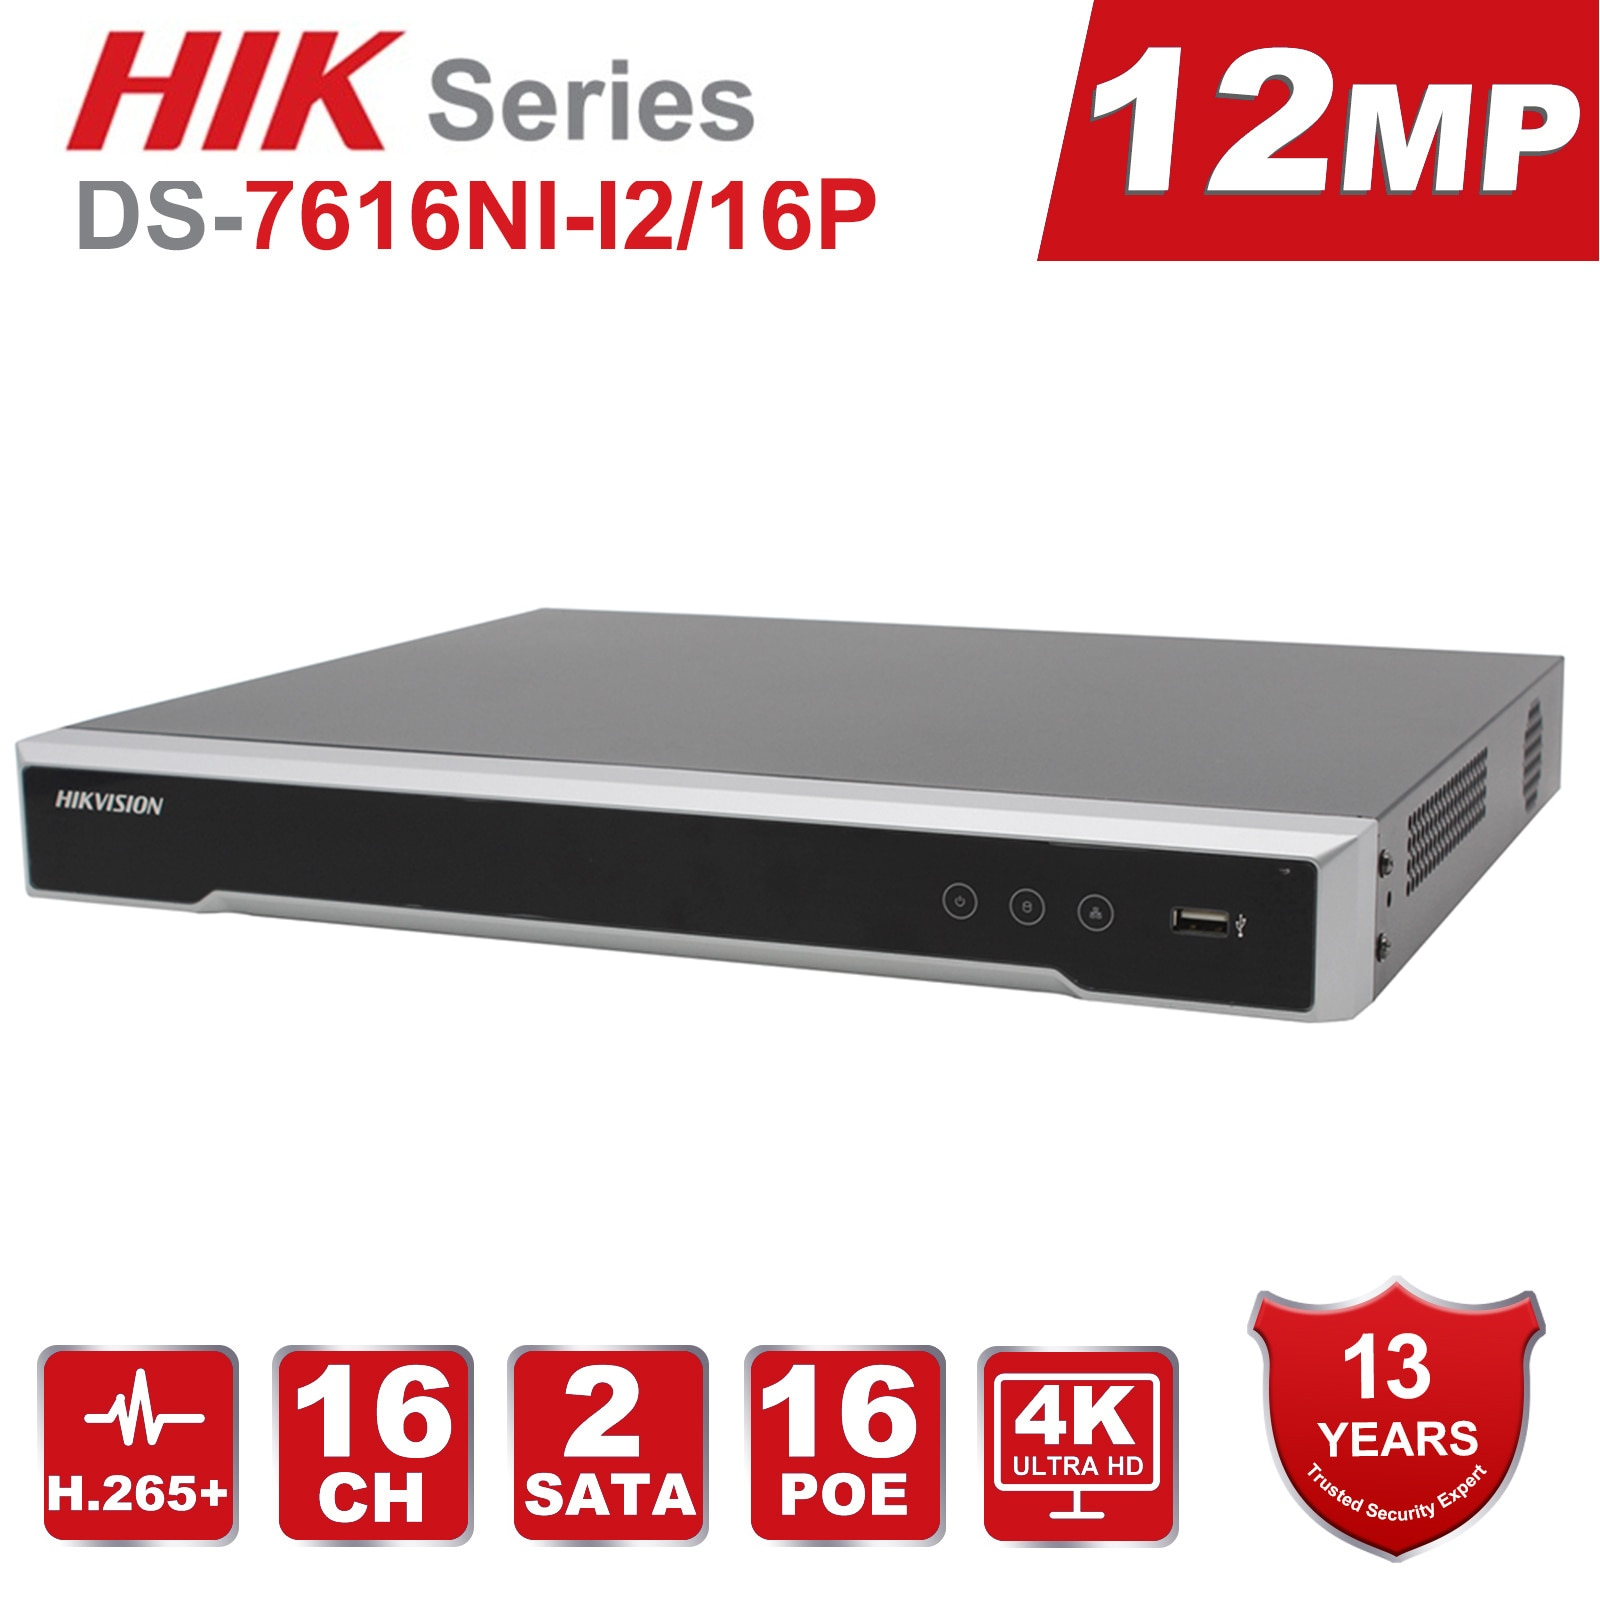 الأصلي Hikvision NVR 4K 12MP 16CH DS-7616NI-I2/16 P H.265 + POE NVR 2SATA 16 POE ميناء HDMI VGA التوصيل والتشغيل مع Anpviz IP كاميرا